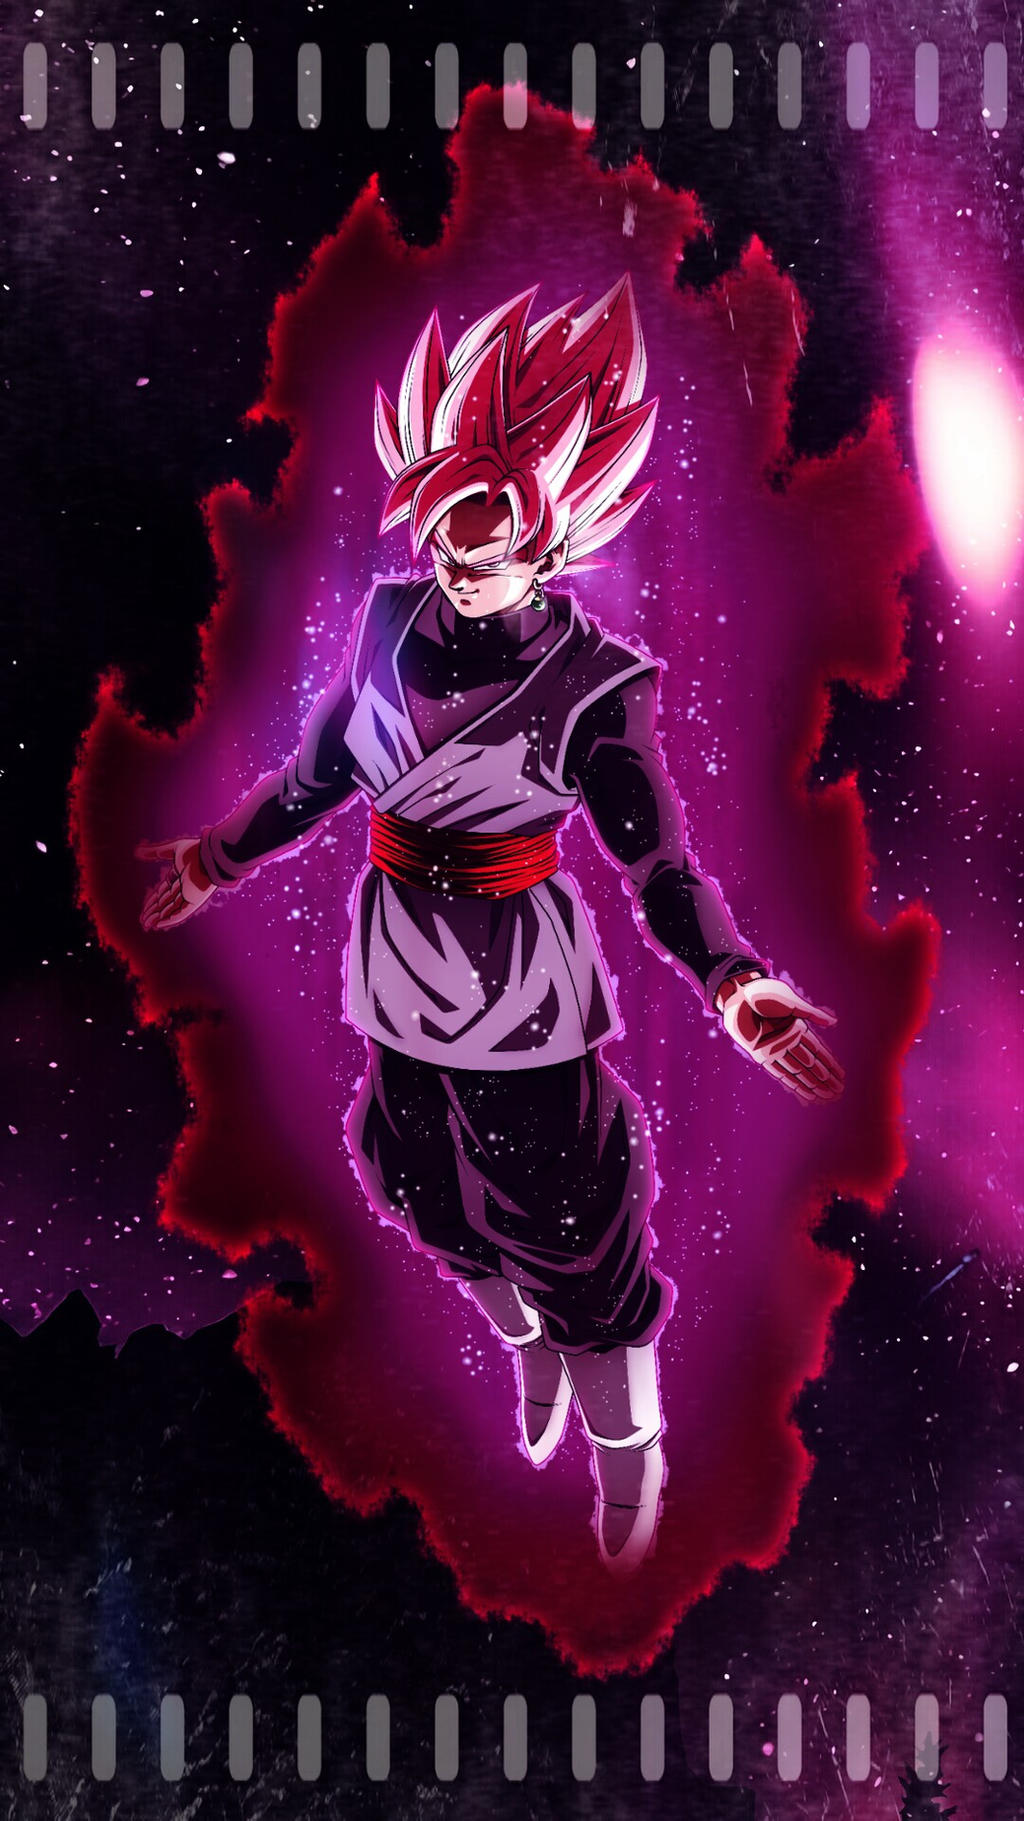 Goku Black Ssj Rose Wallpaper By Victor90900 On Deviantart